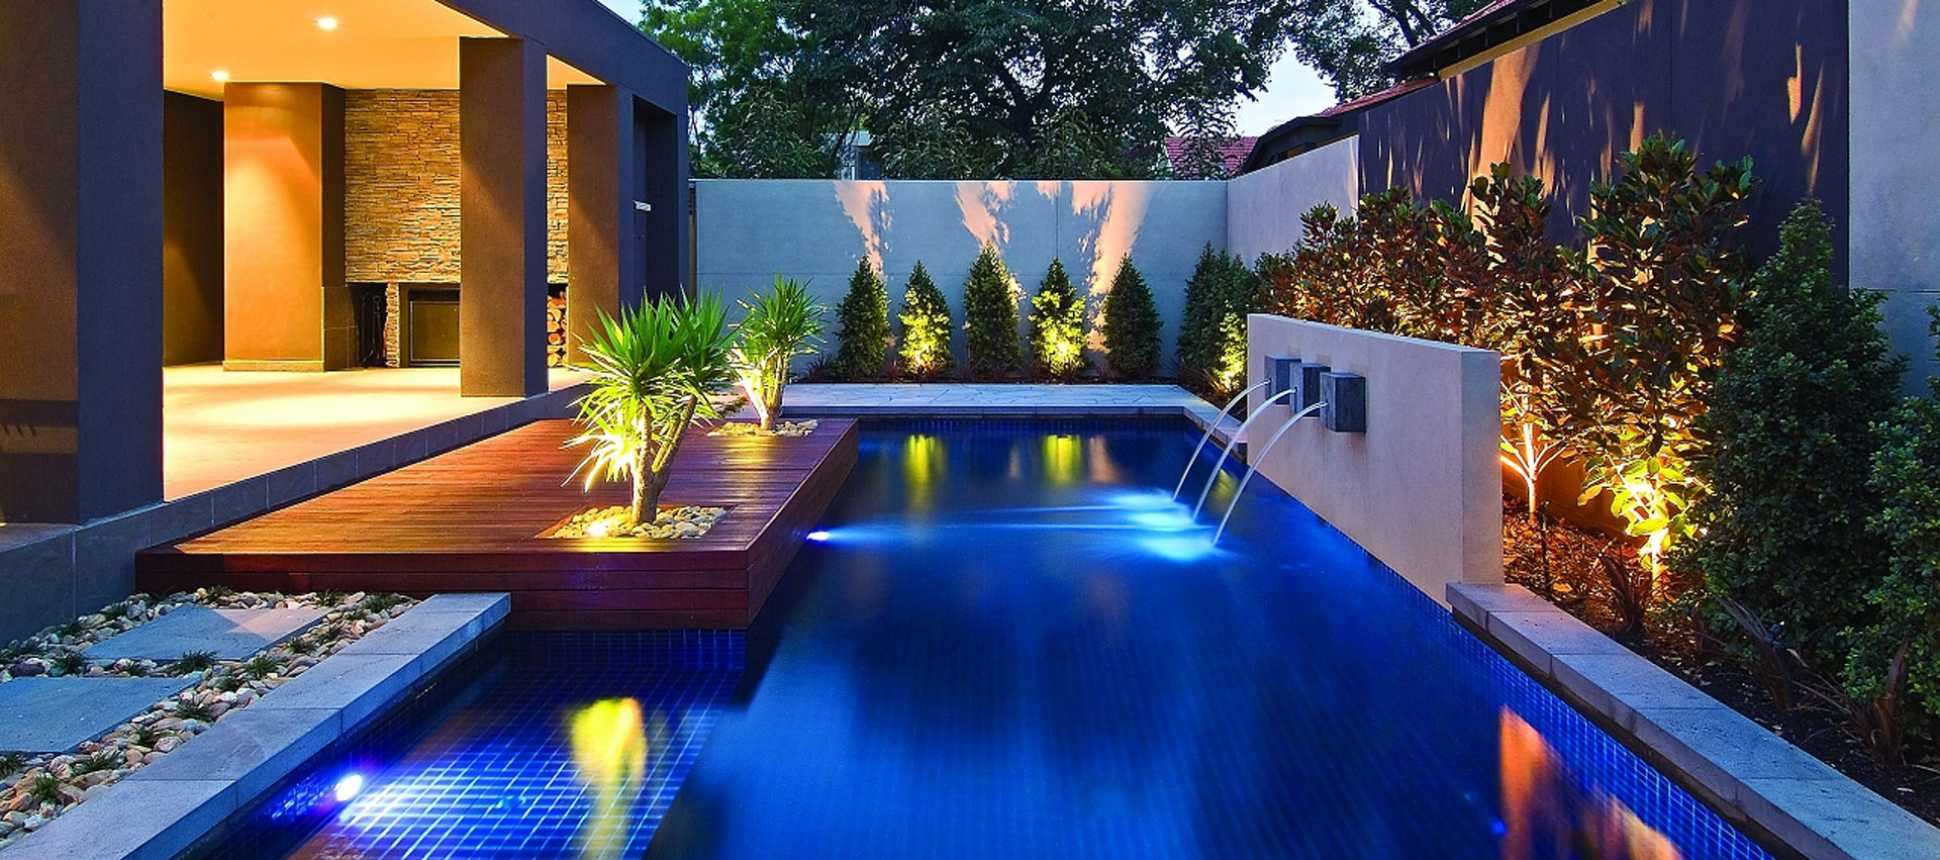 poolbeleuchtung ac schwimmbadtechnik. Black Bedroom Furniture Sets. Home Design Ideas